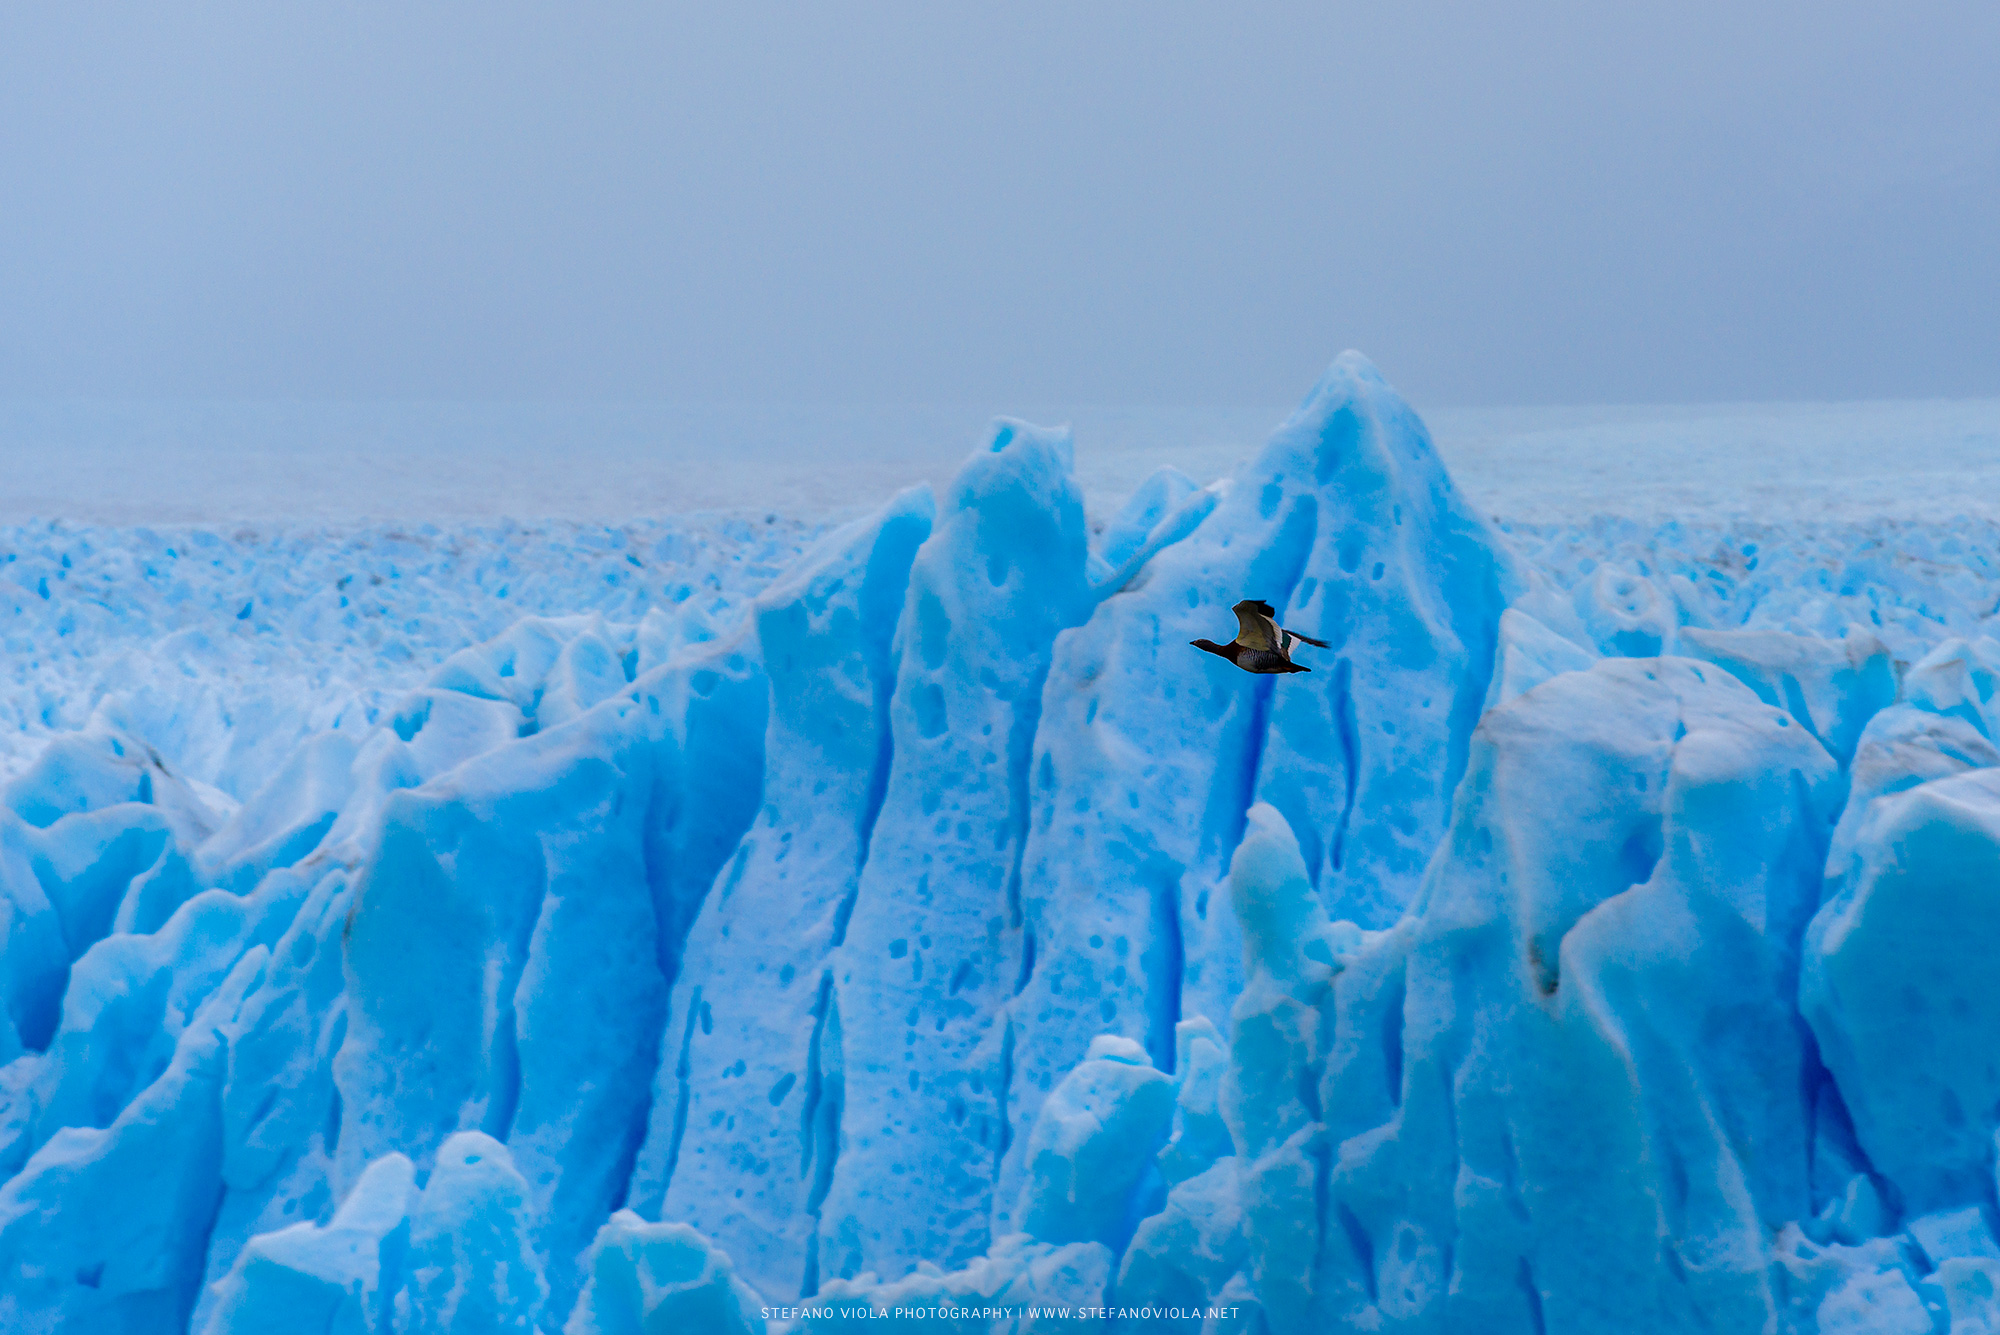 A bird flying over Perito Moreno glacier